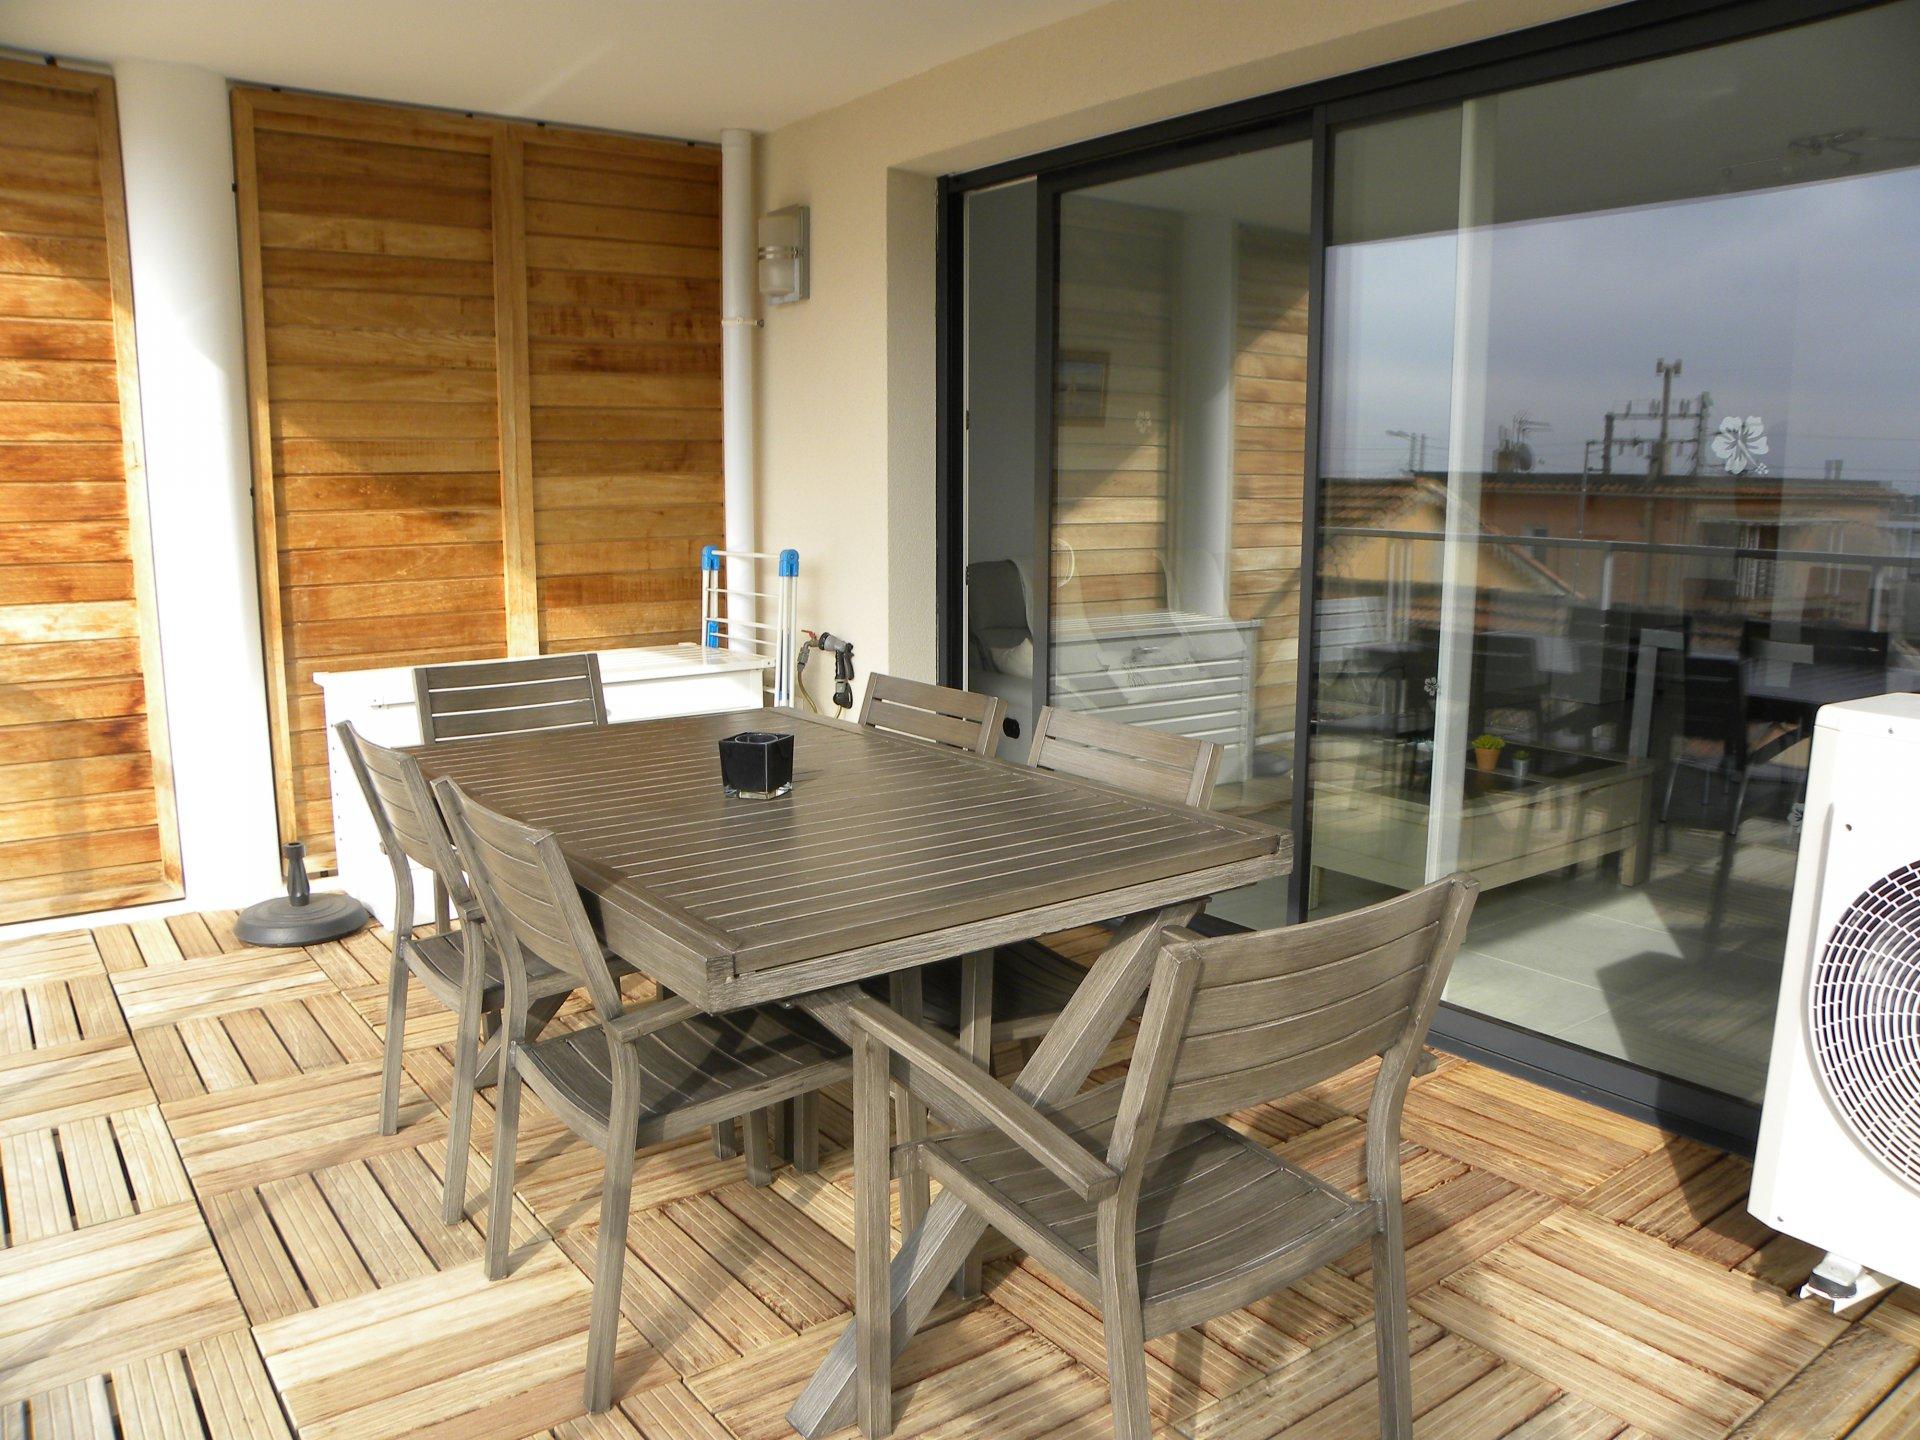 Terrasse 15 m² aménagée